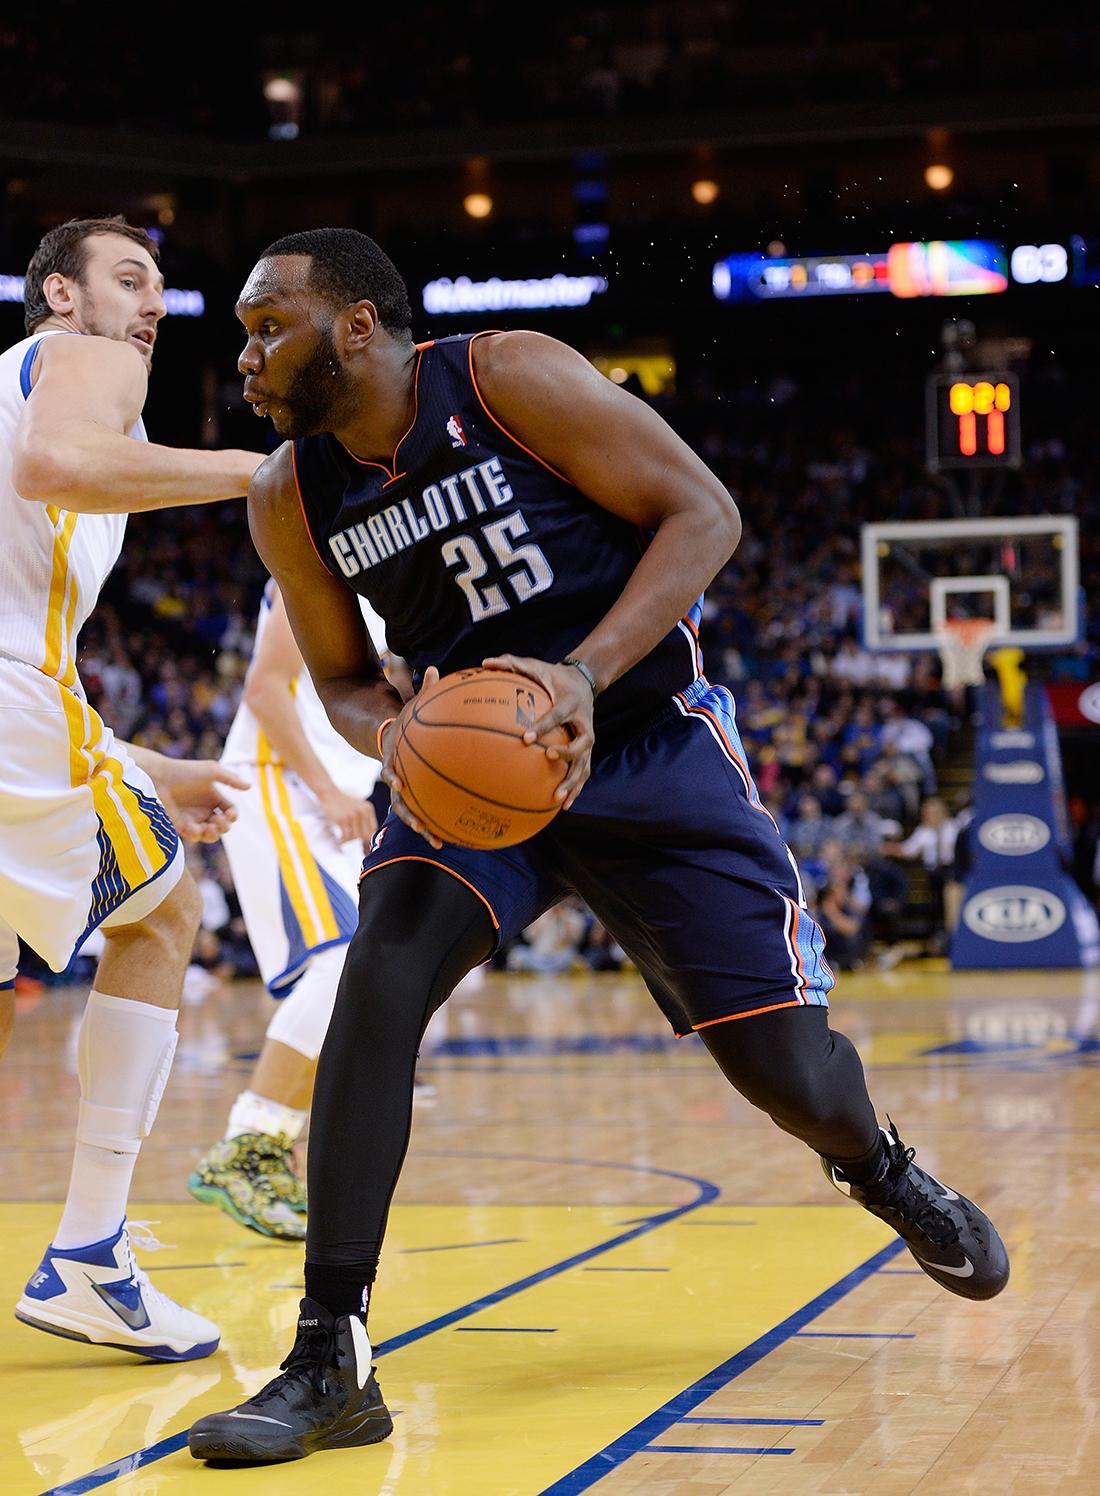 al jefferson de los Charlotte Bobcats v Golden State Warriors en viva basquet